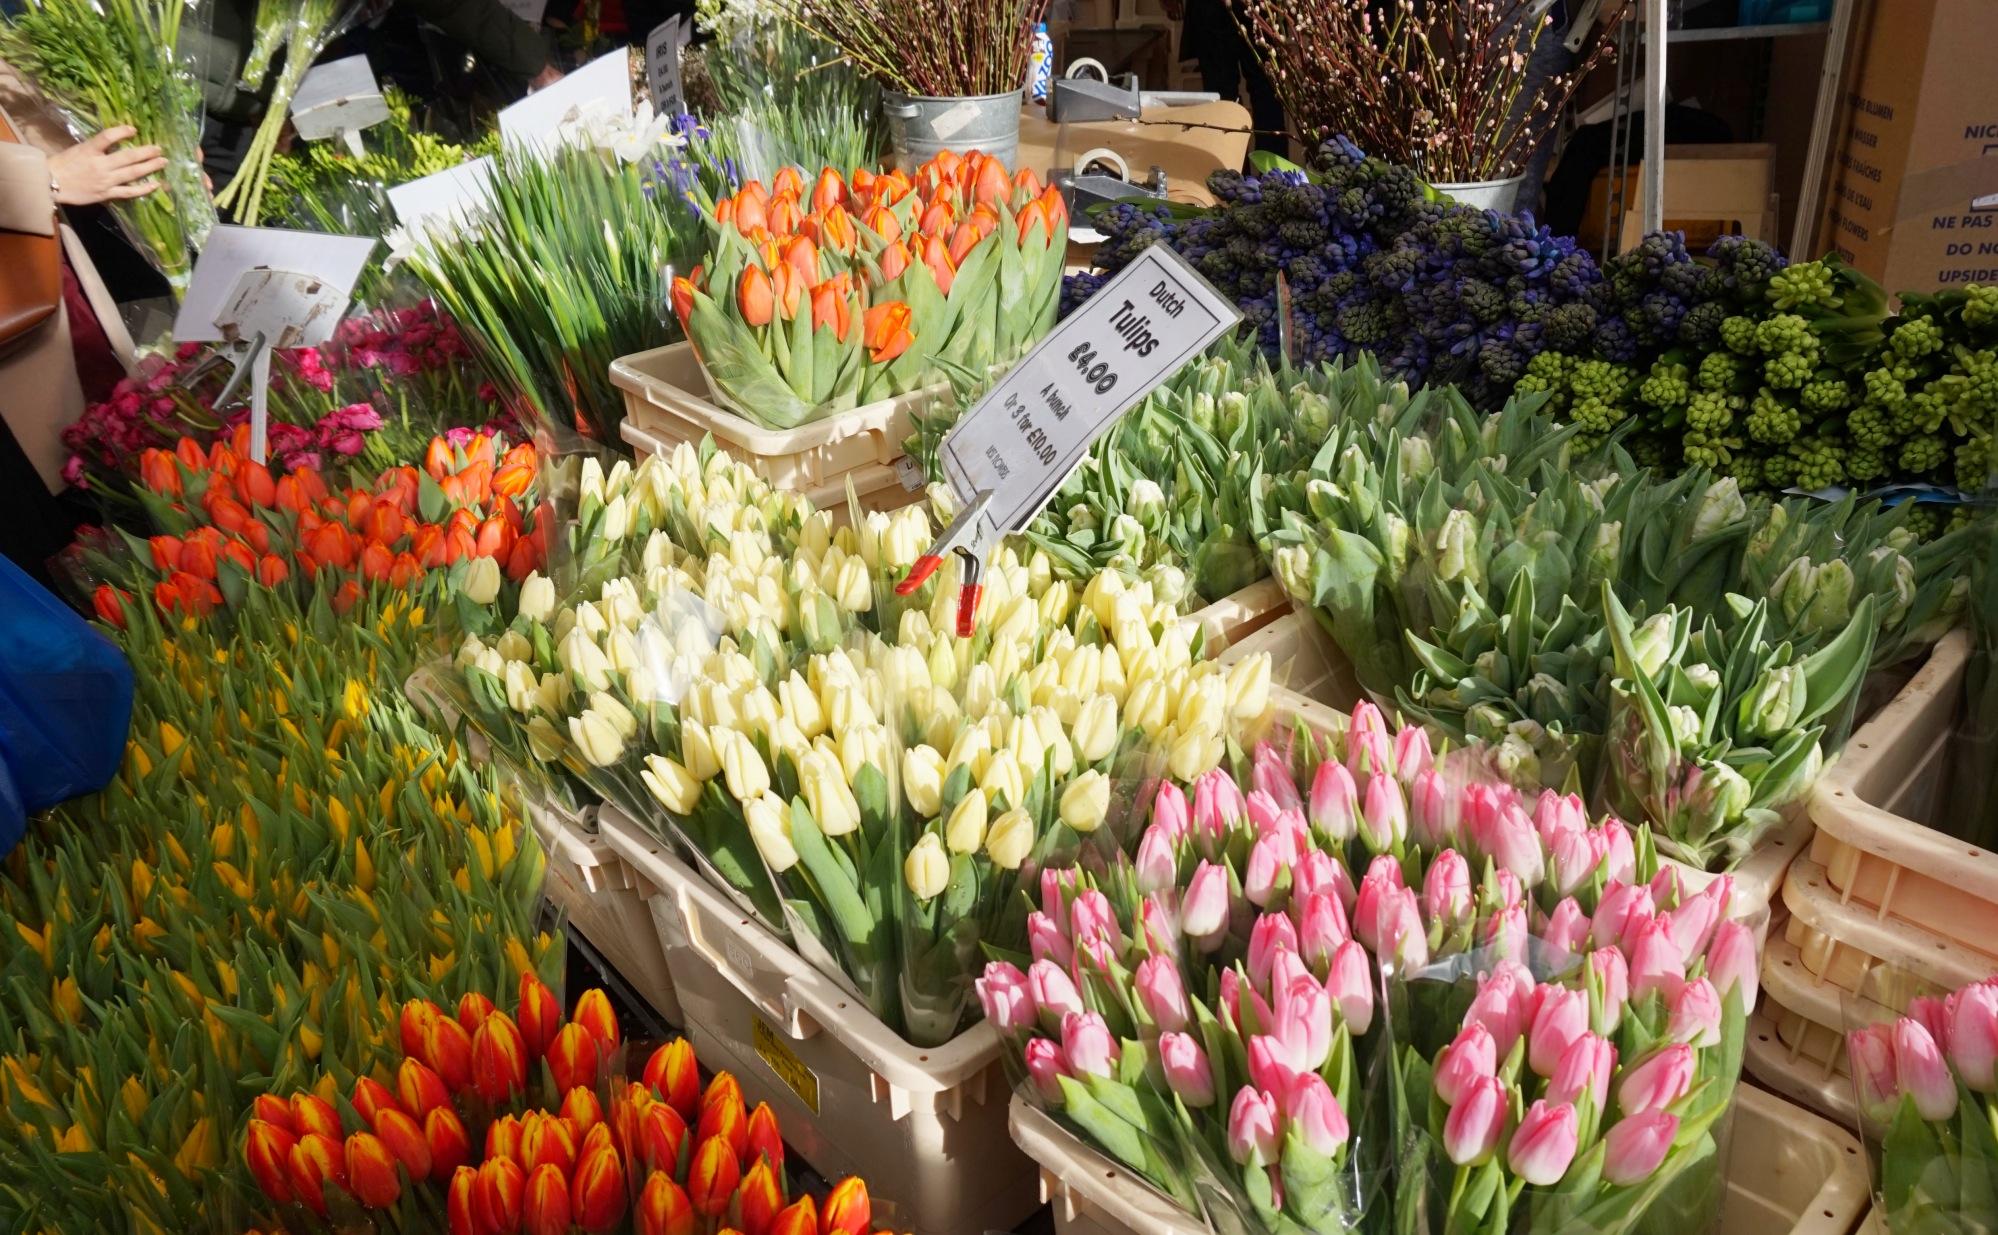 Balade-Columbia-Road-Flower-Market-2